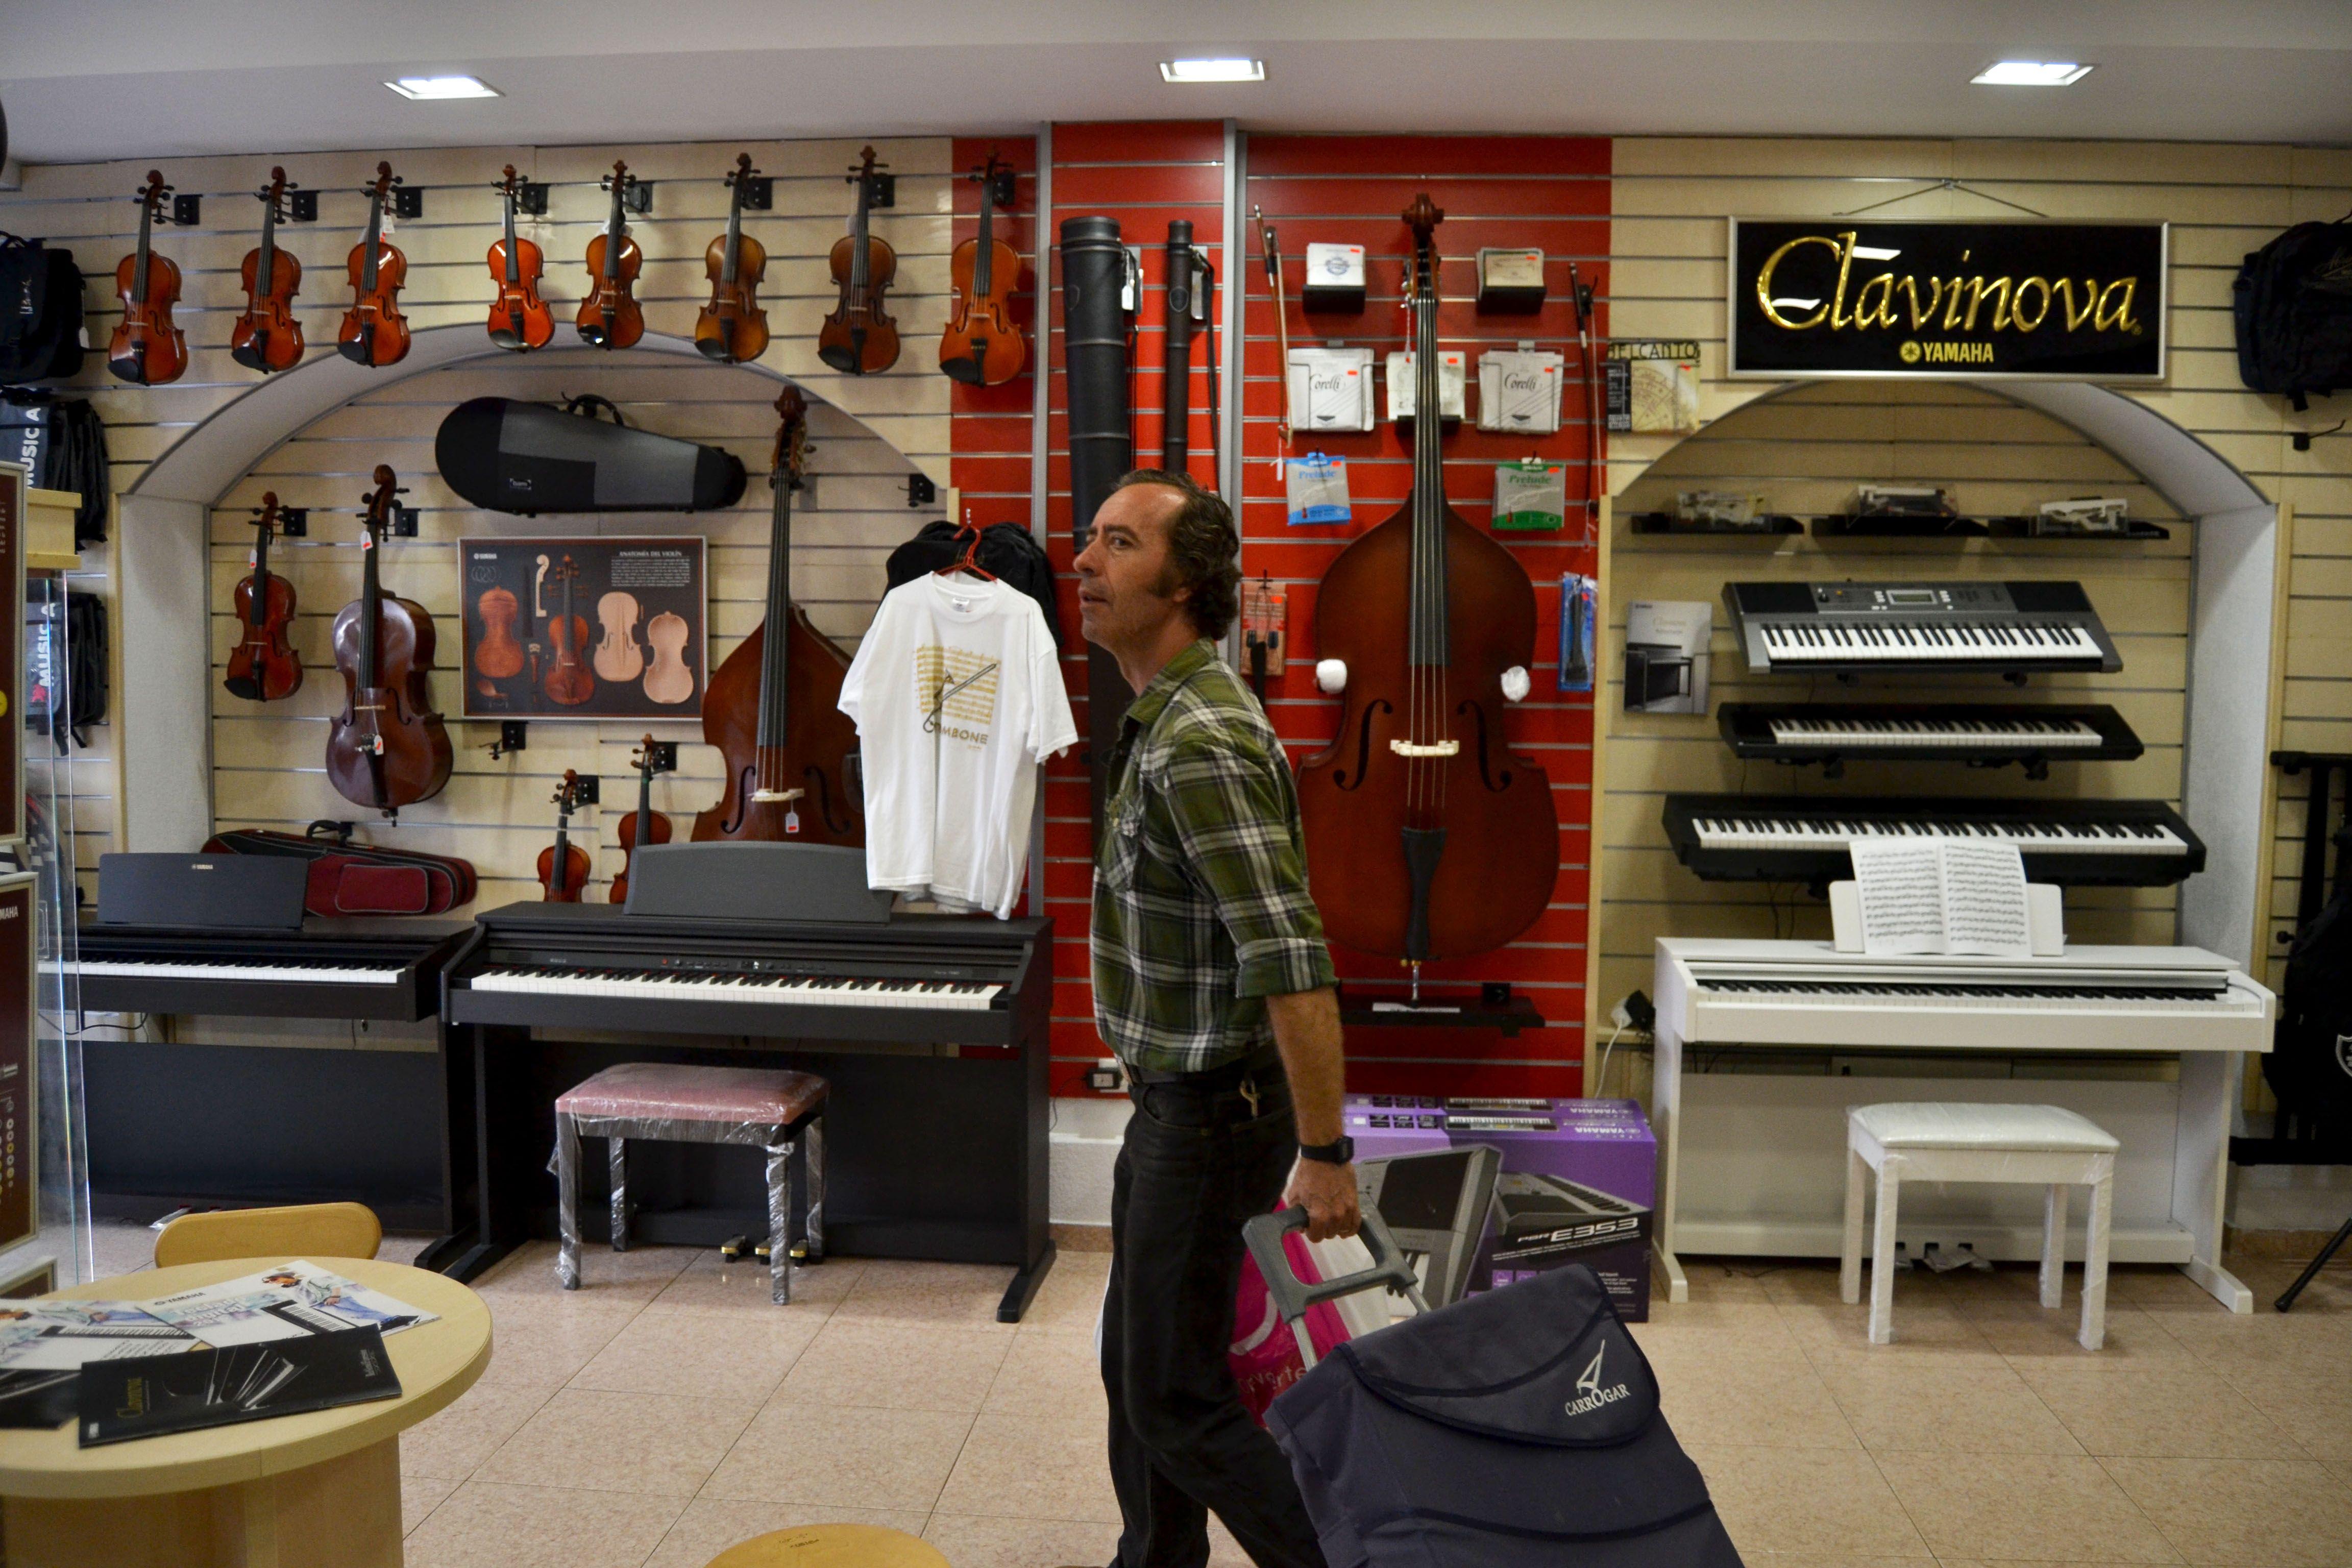 Prieto Musica La Ilusion De Crear Trabajo Gracias A Tu Gran